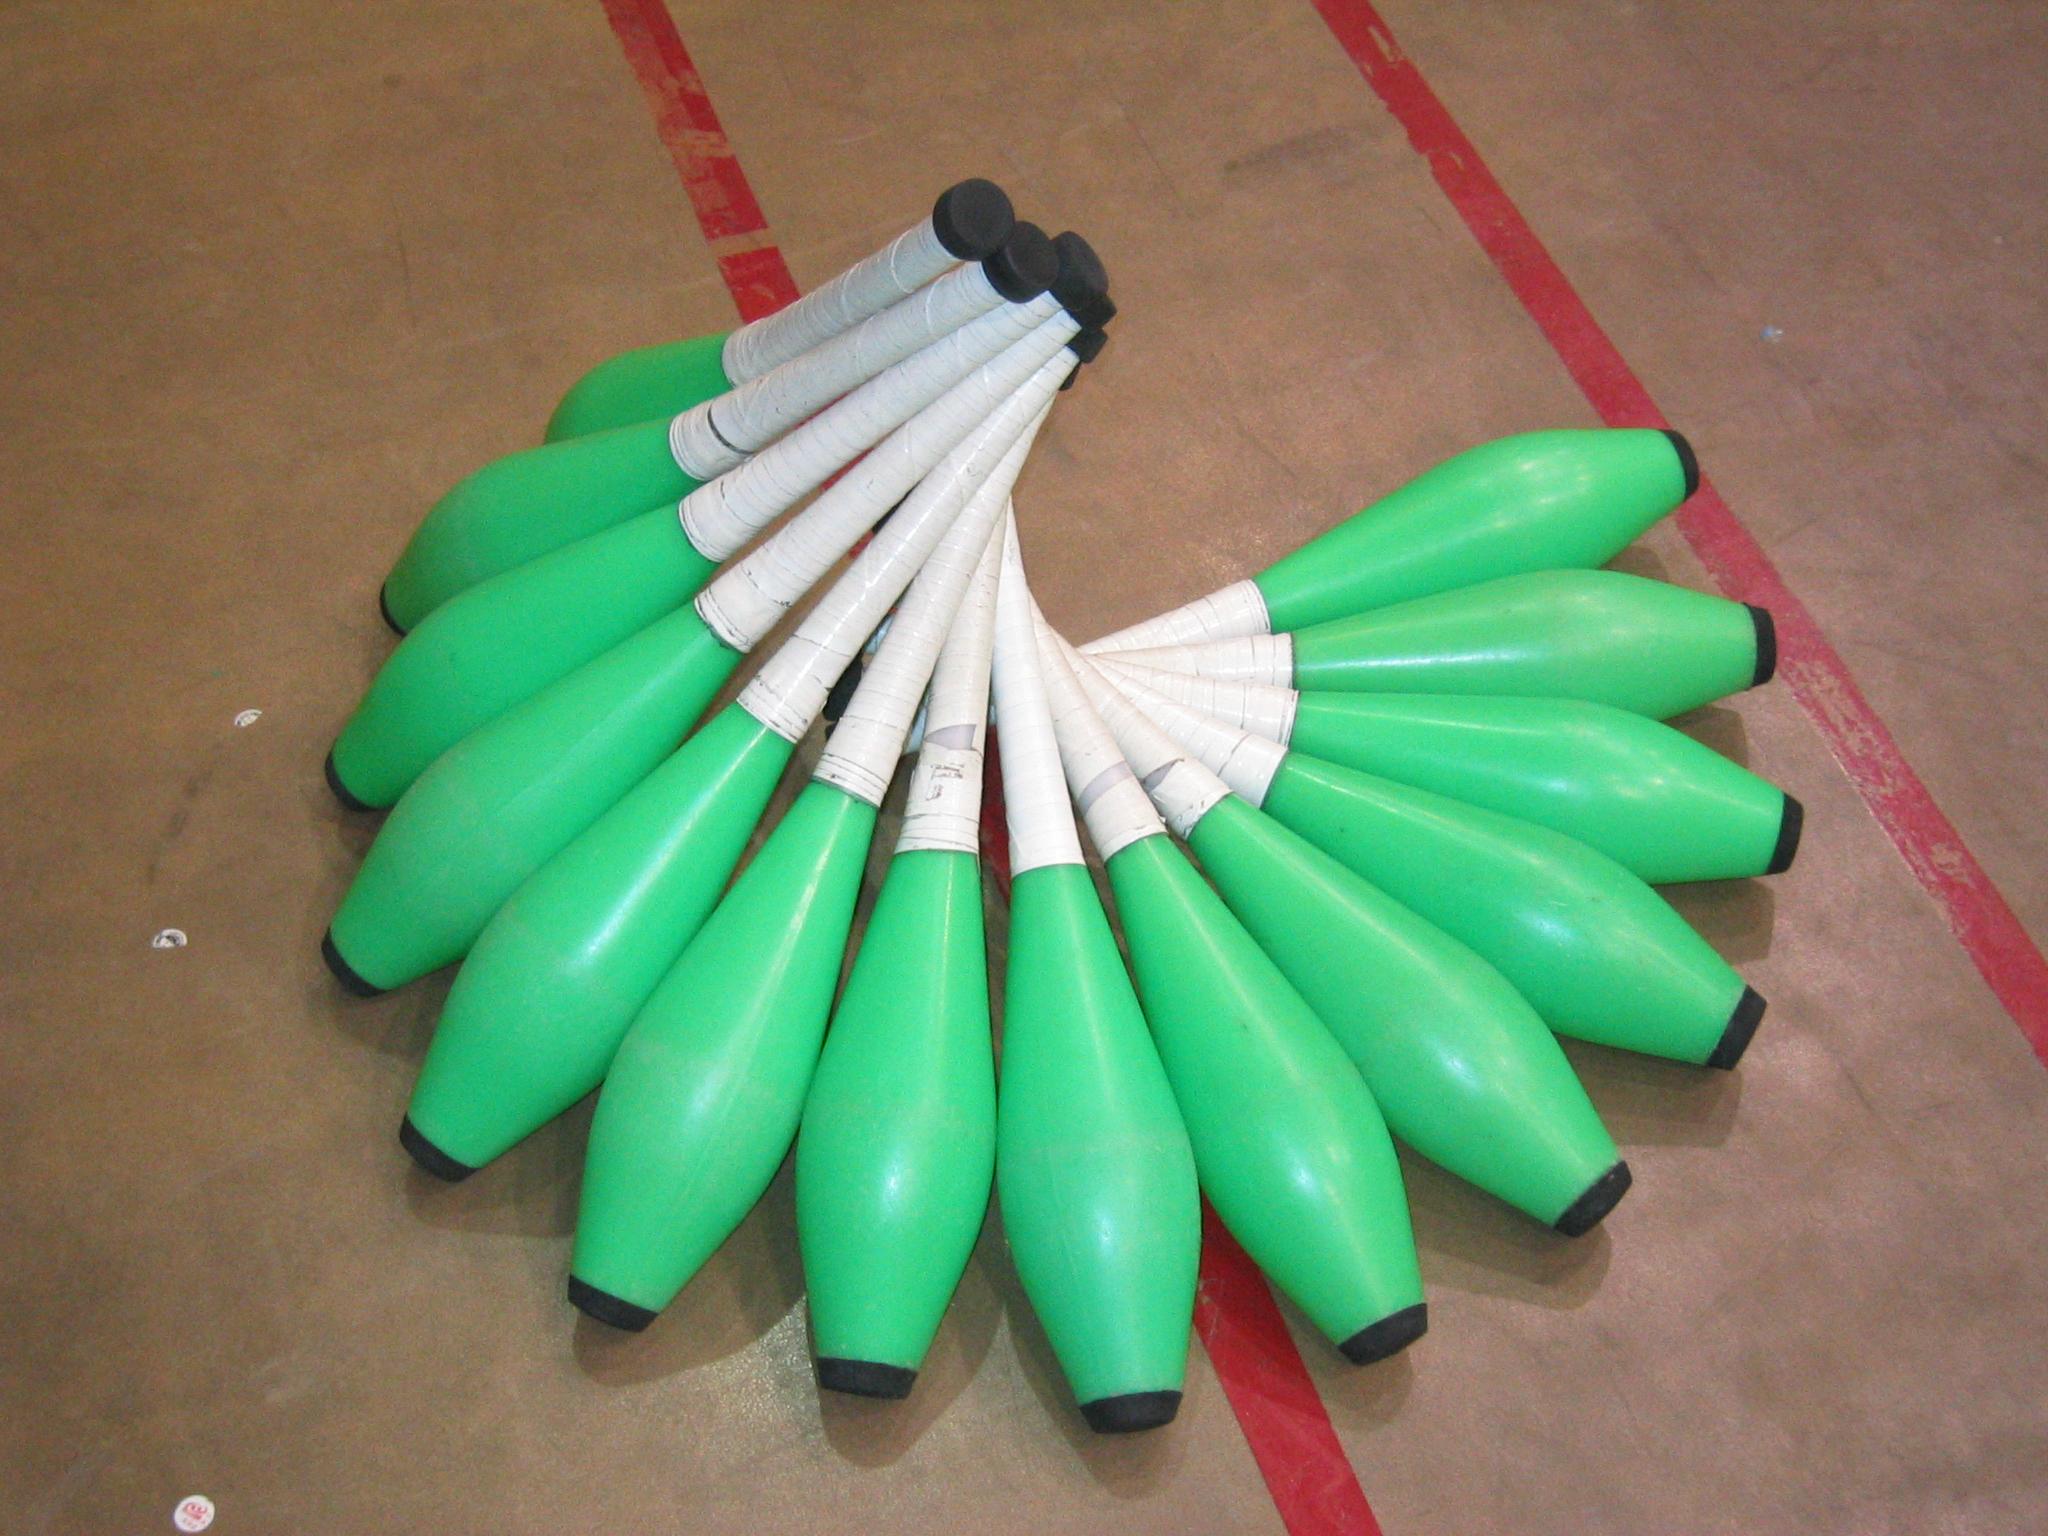 roys green clubs